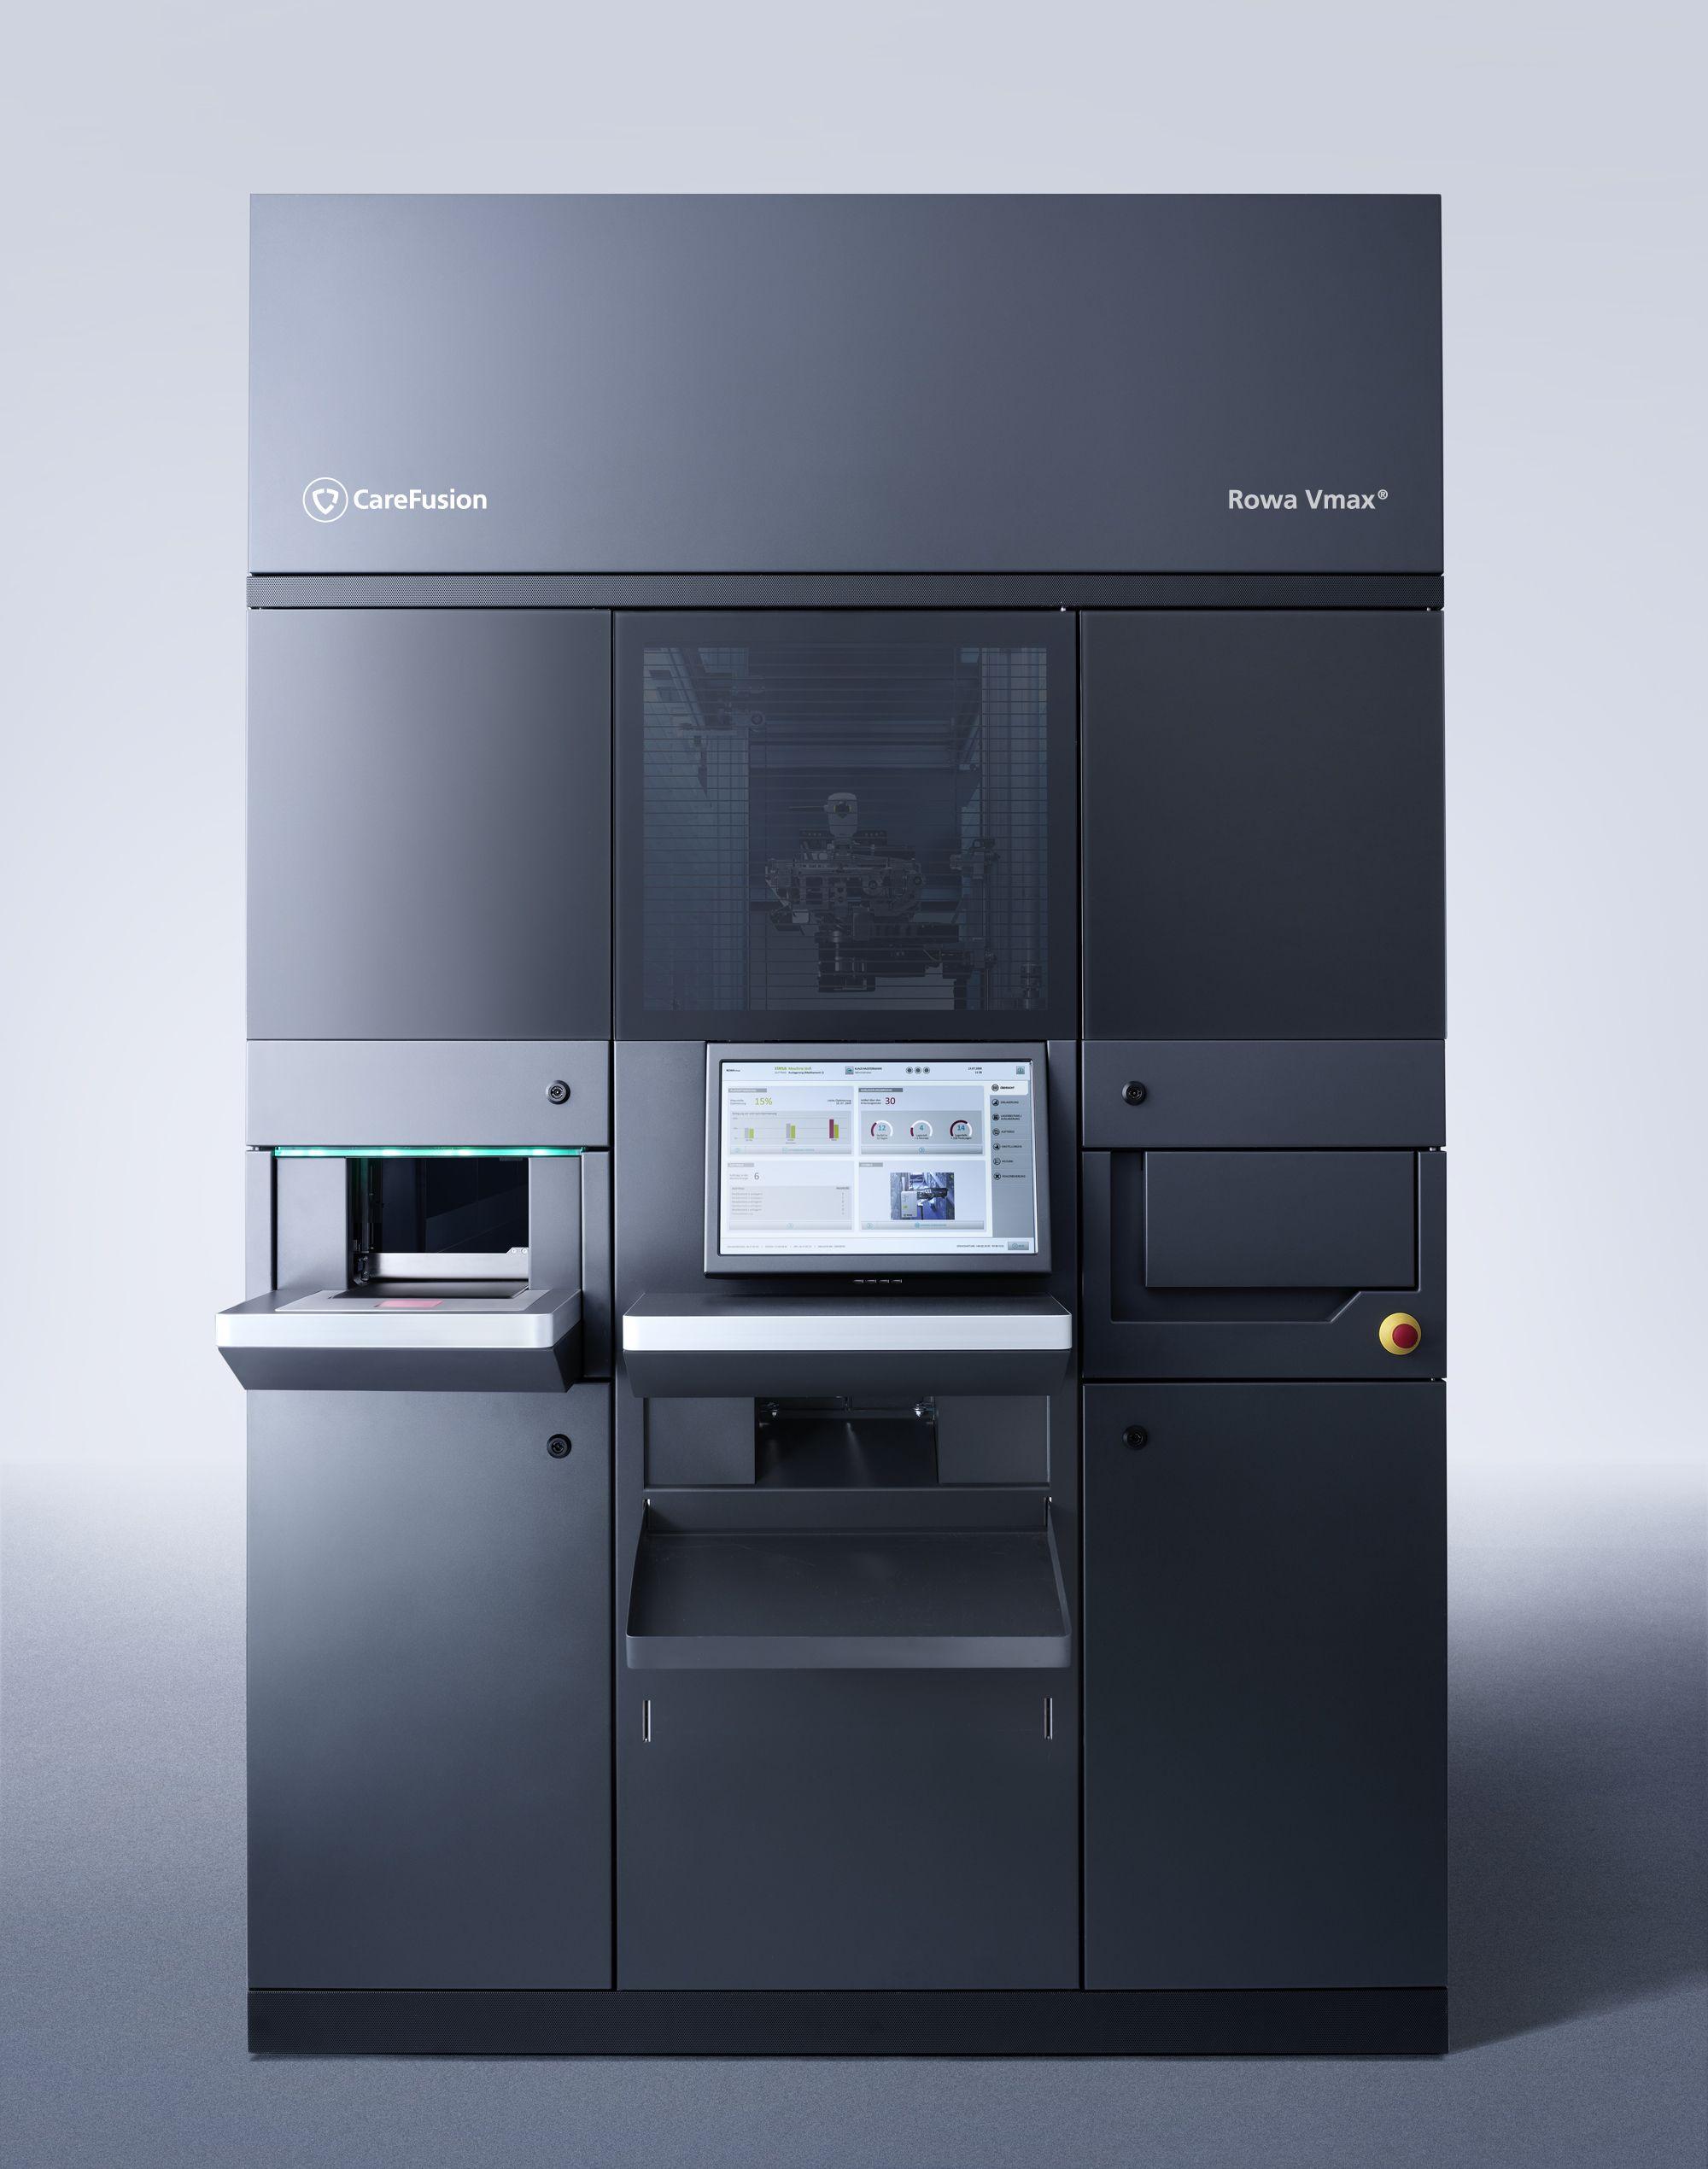 Rowa Vmax Tech design, Internal design, Cnc design